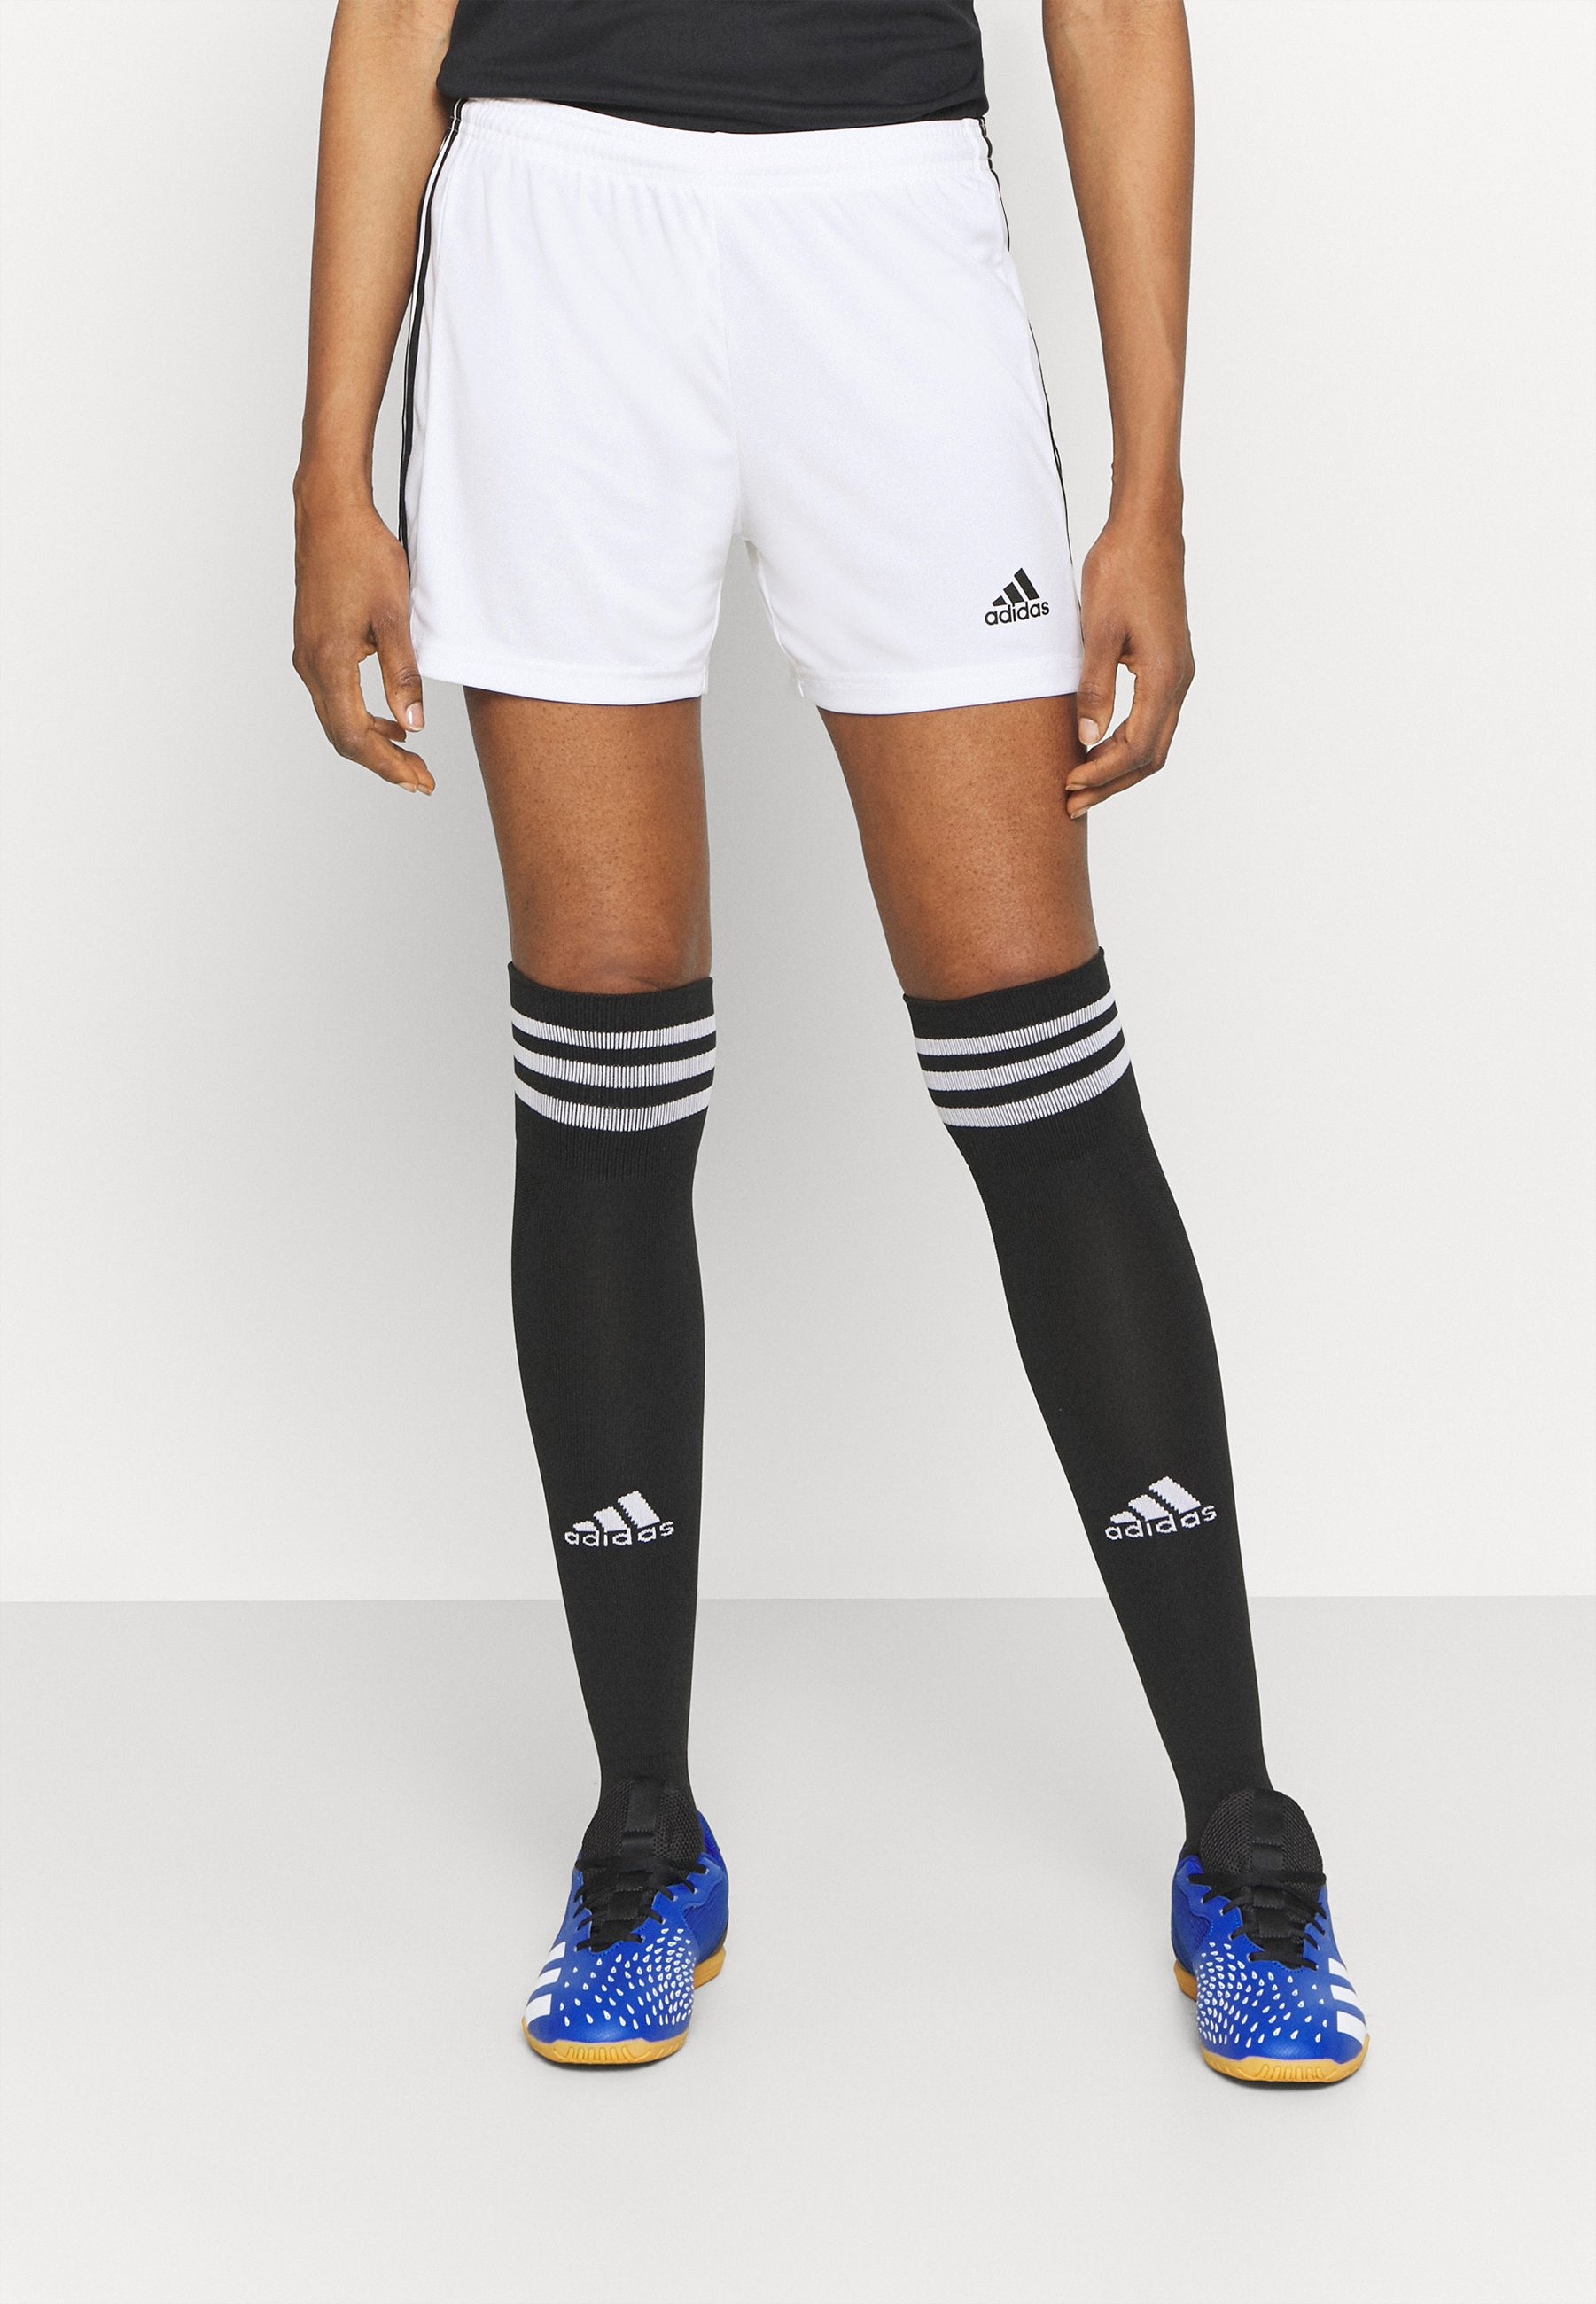 Femme SQUADRA - Short de sport